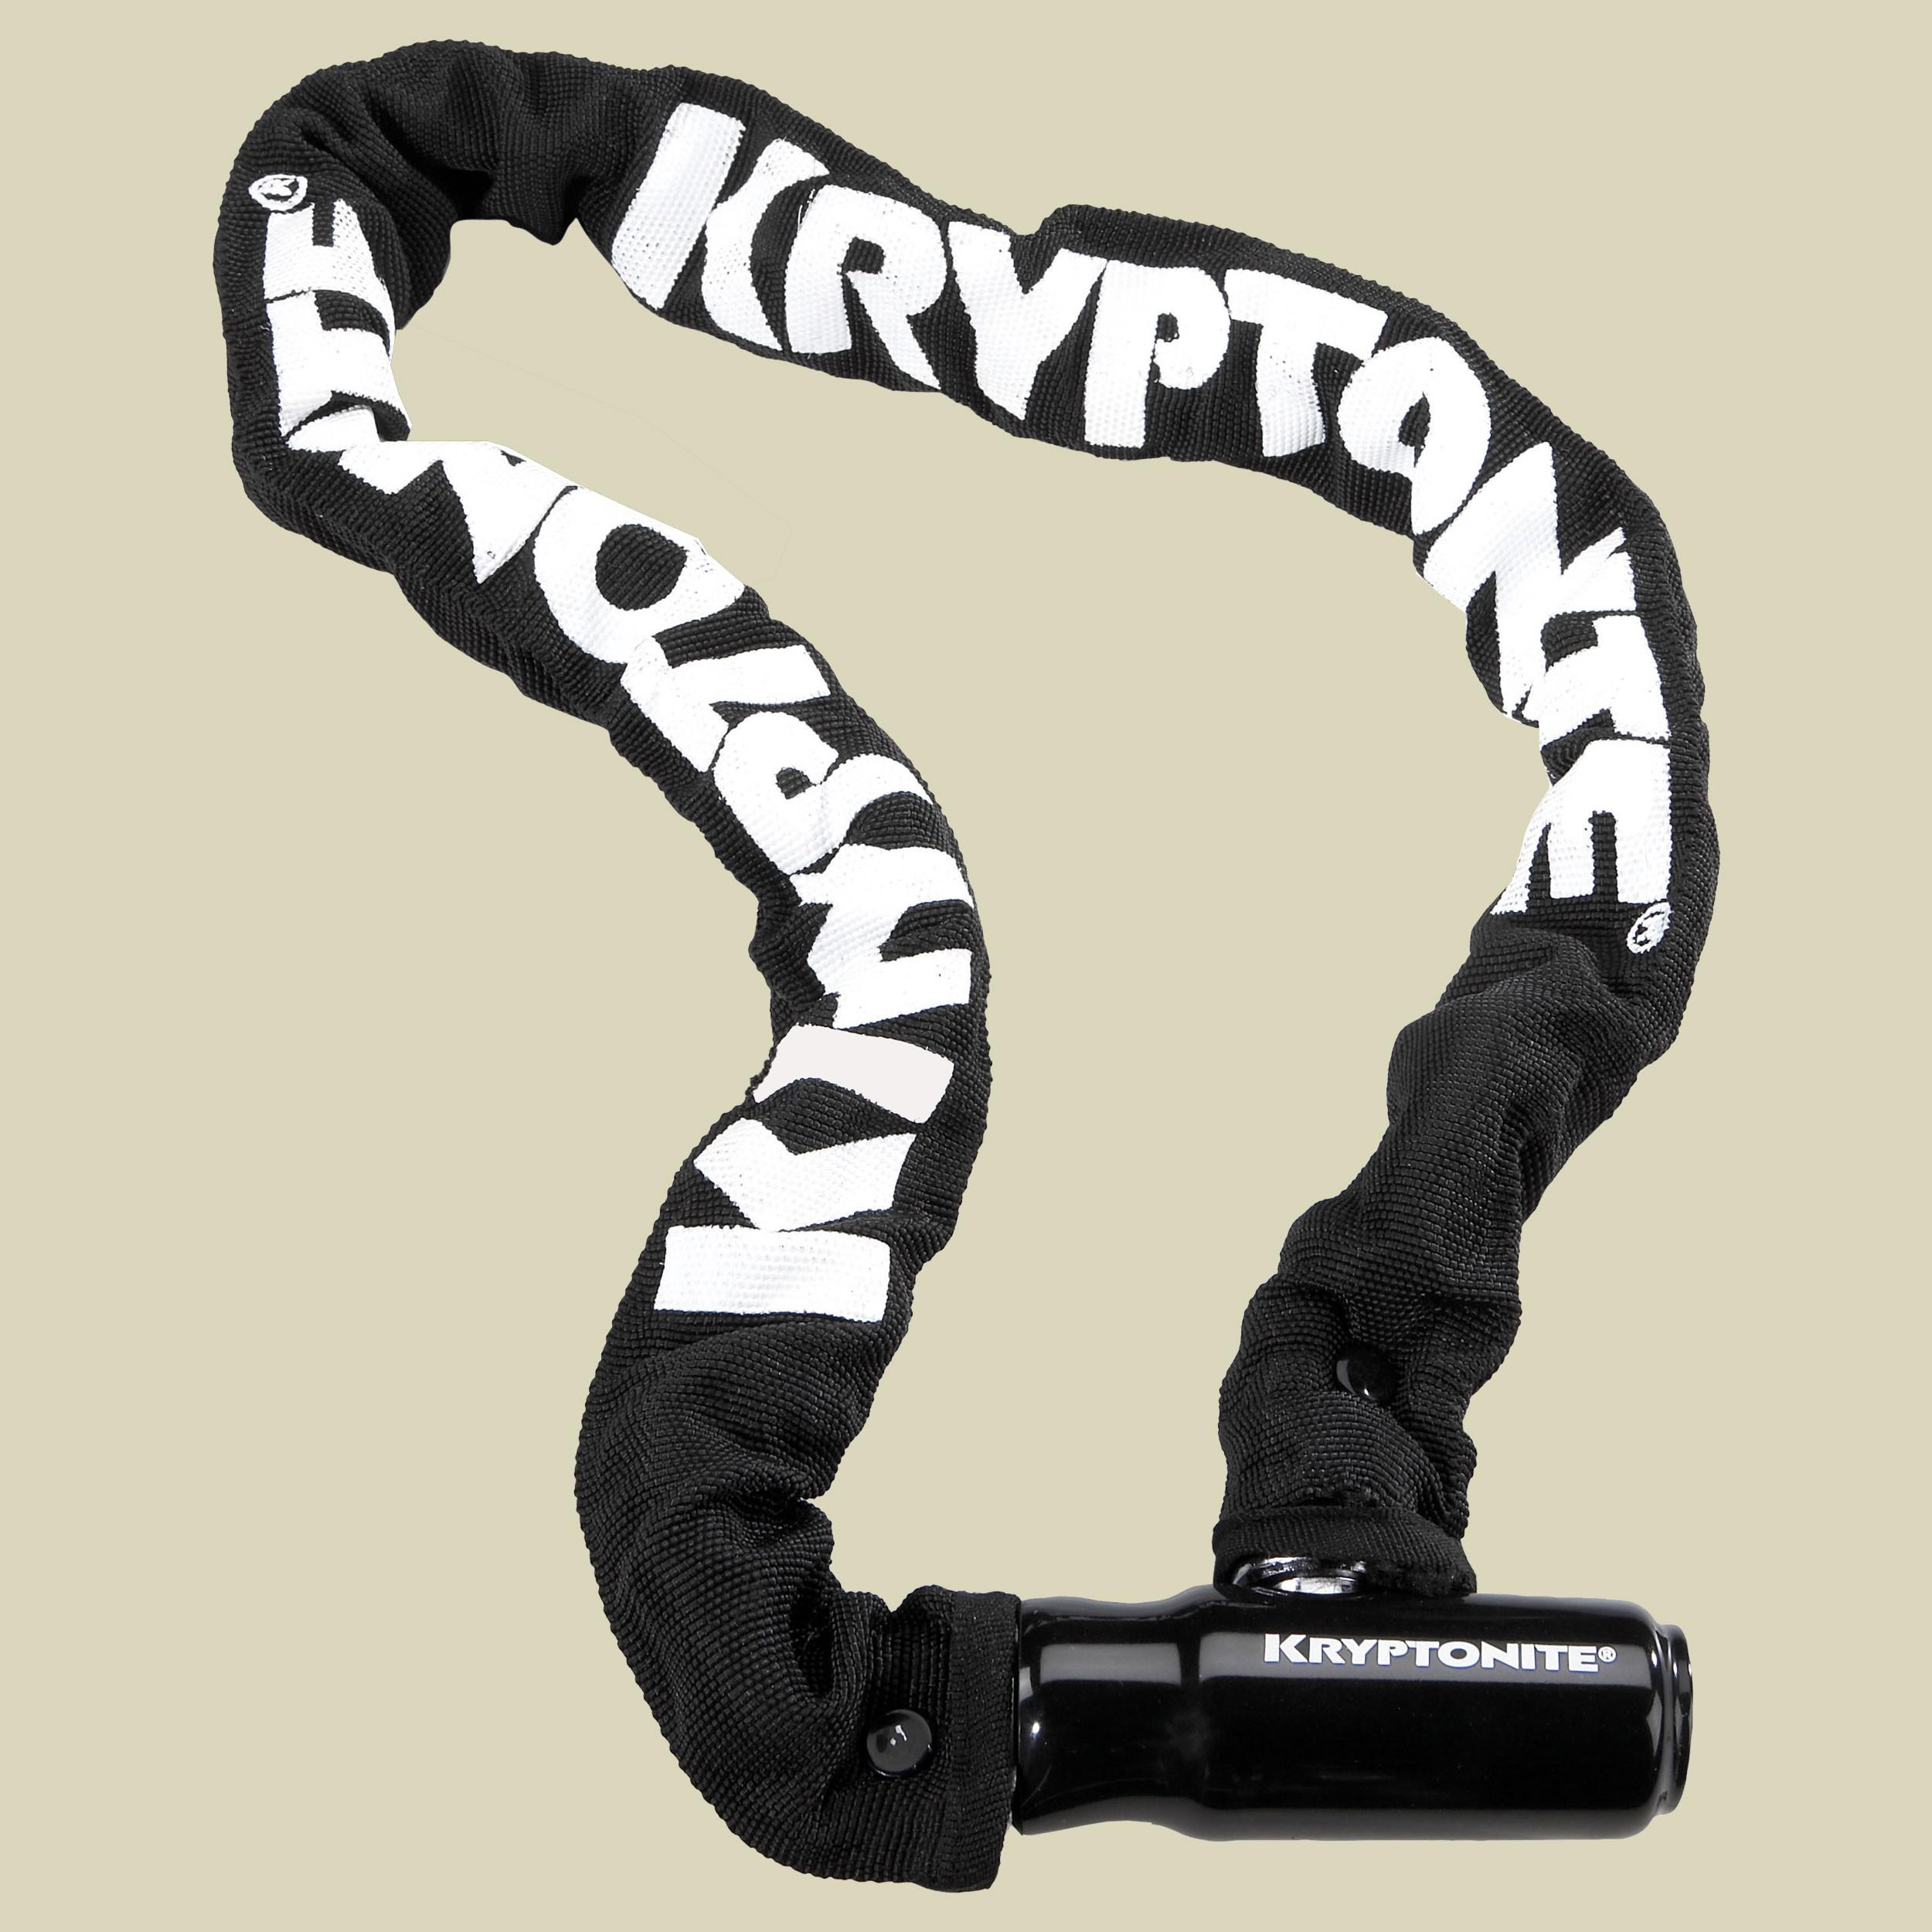 grofa_3500_323_kryptonite_keeper_785_integrated_chain_black_fallback